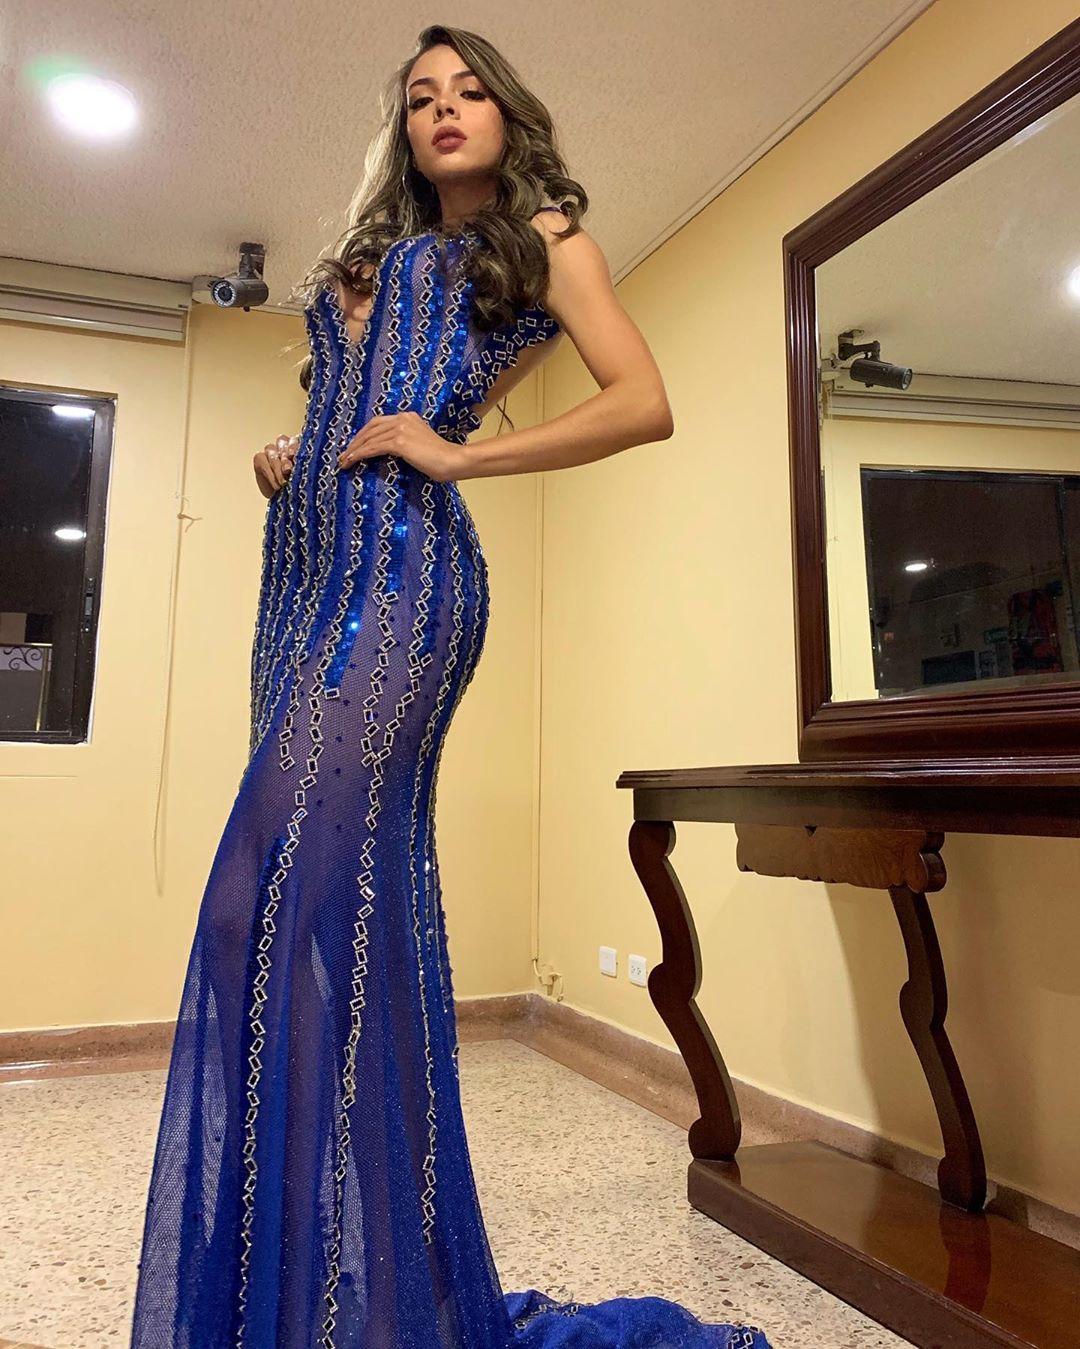 gina aguirre, virreyna de miss latinoamerica 2019. - Página 3 67080310